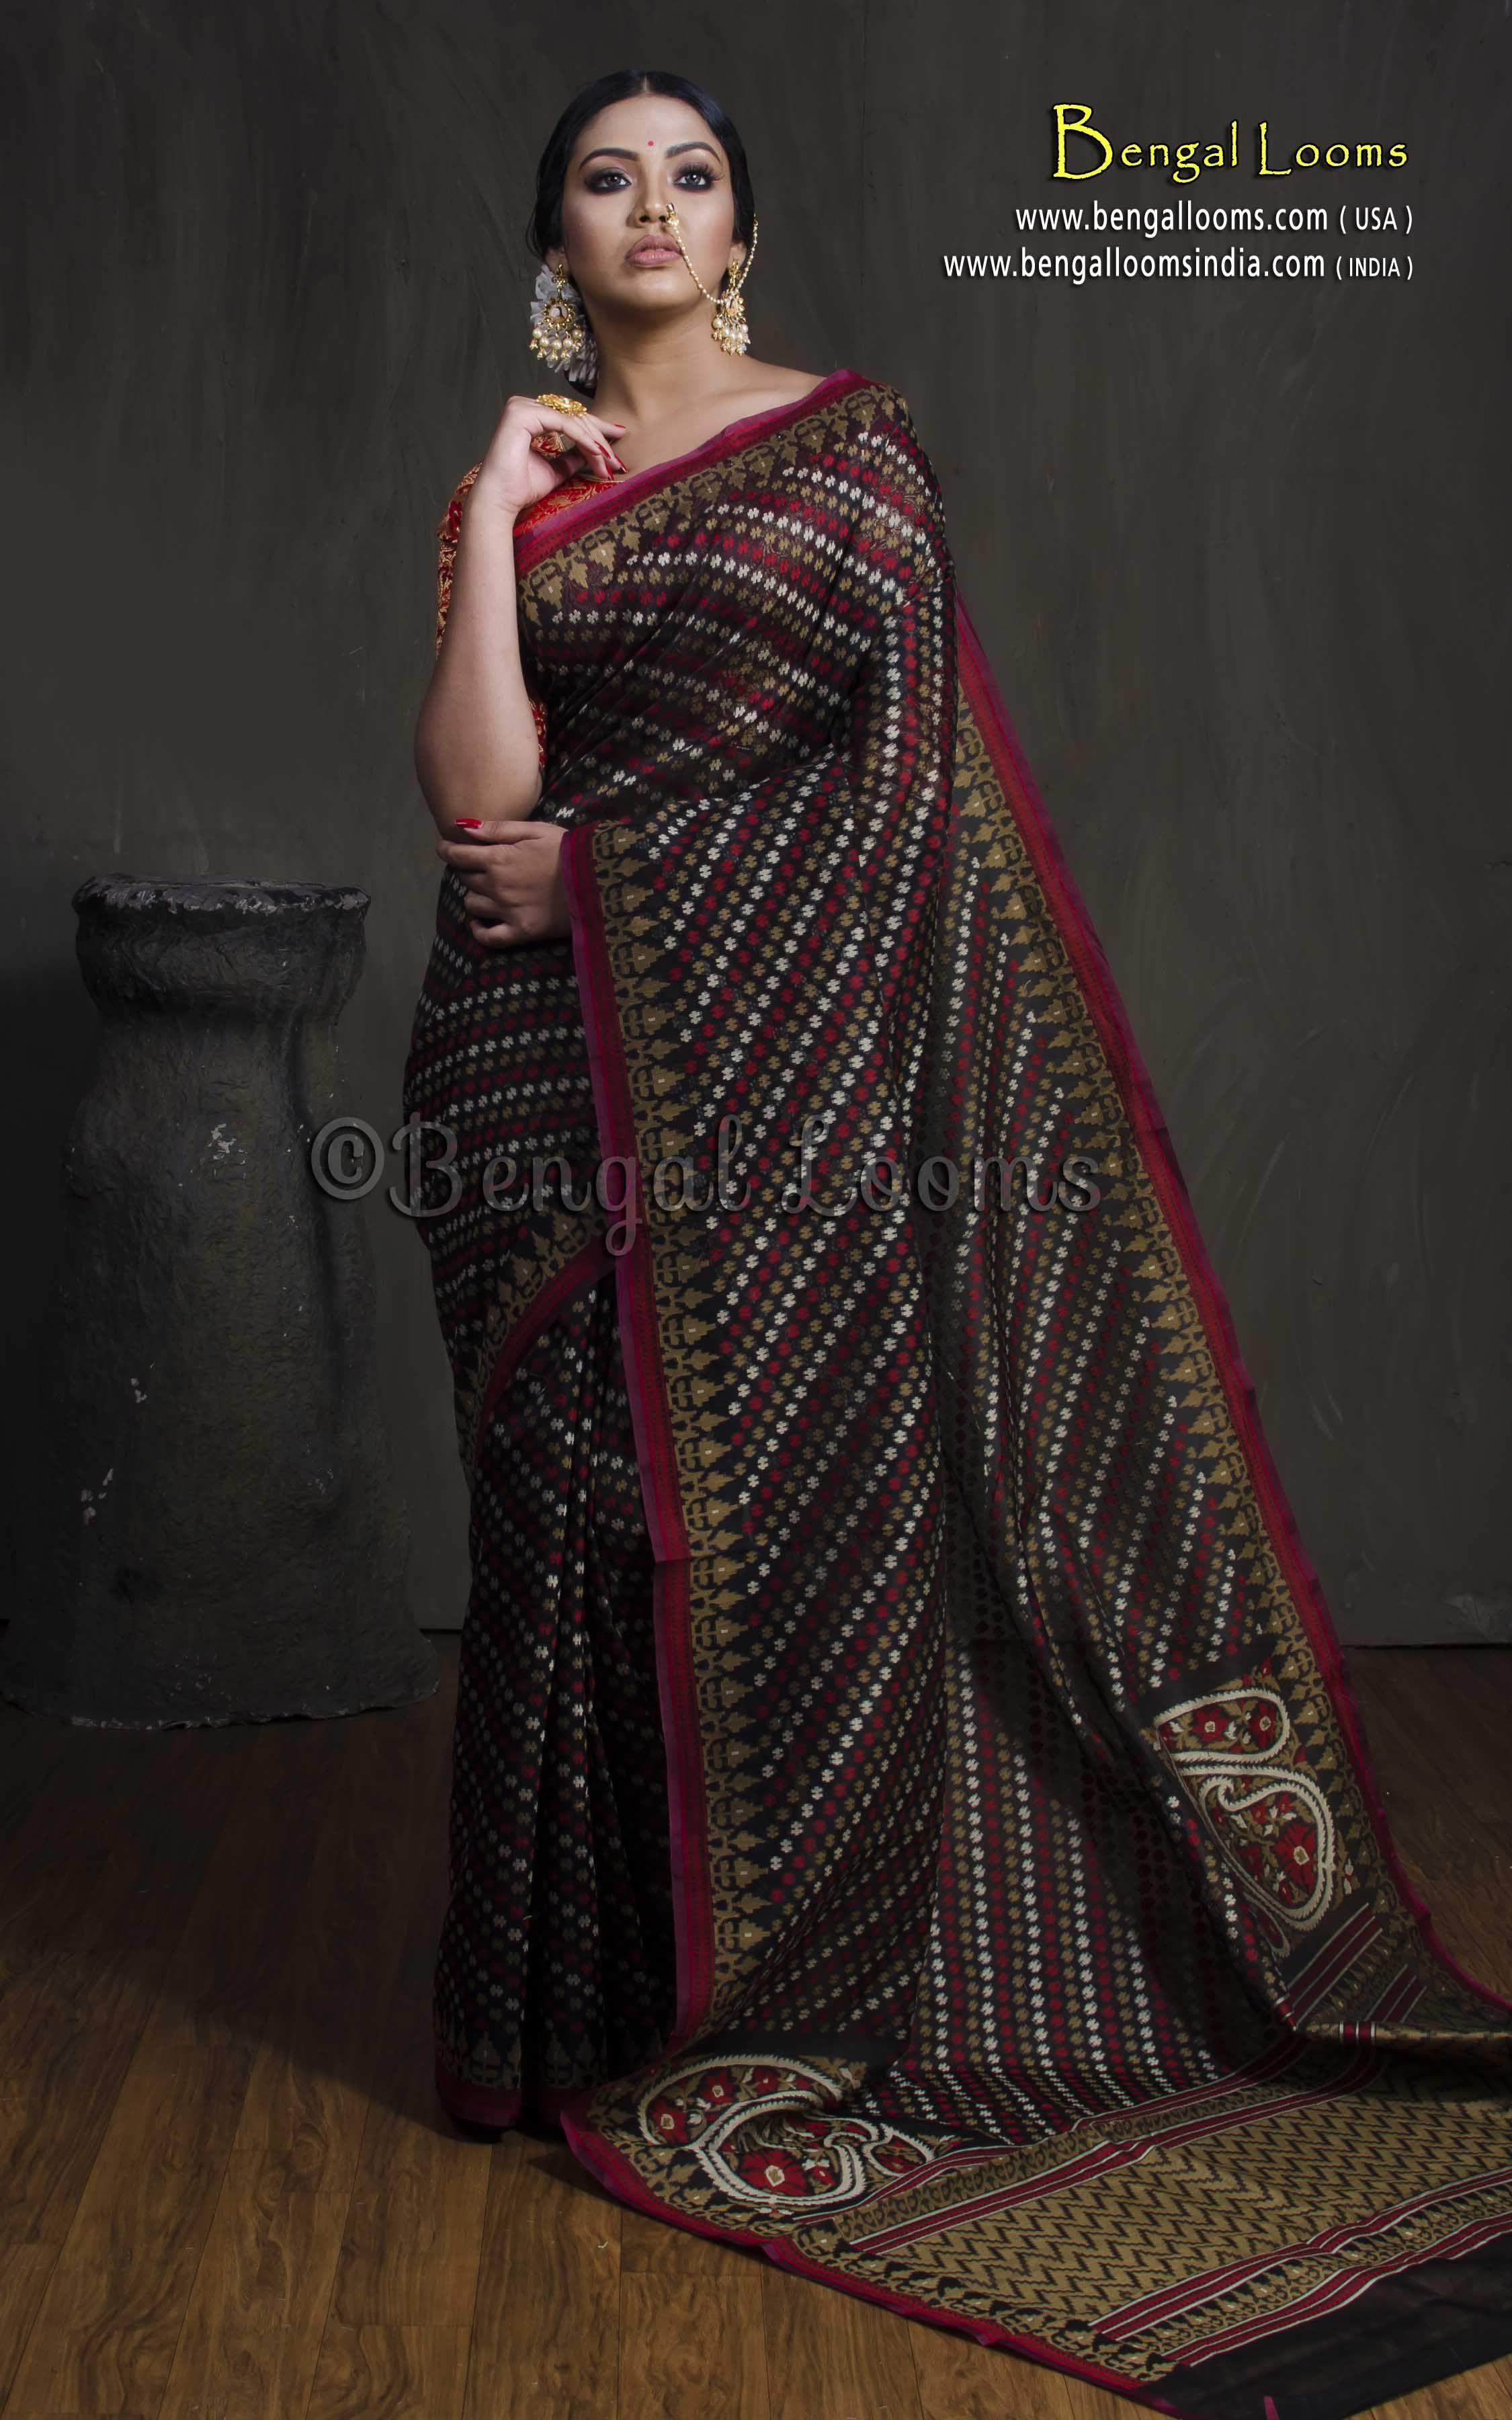 2981b600d6f6c Kora Cotton Silk Hazar Buti Banarasi Saree in Black